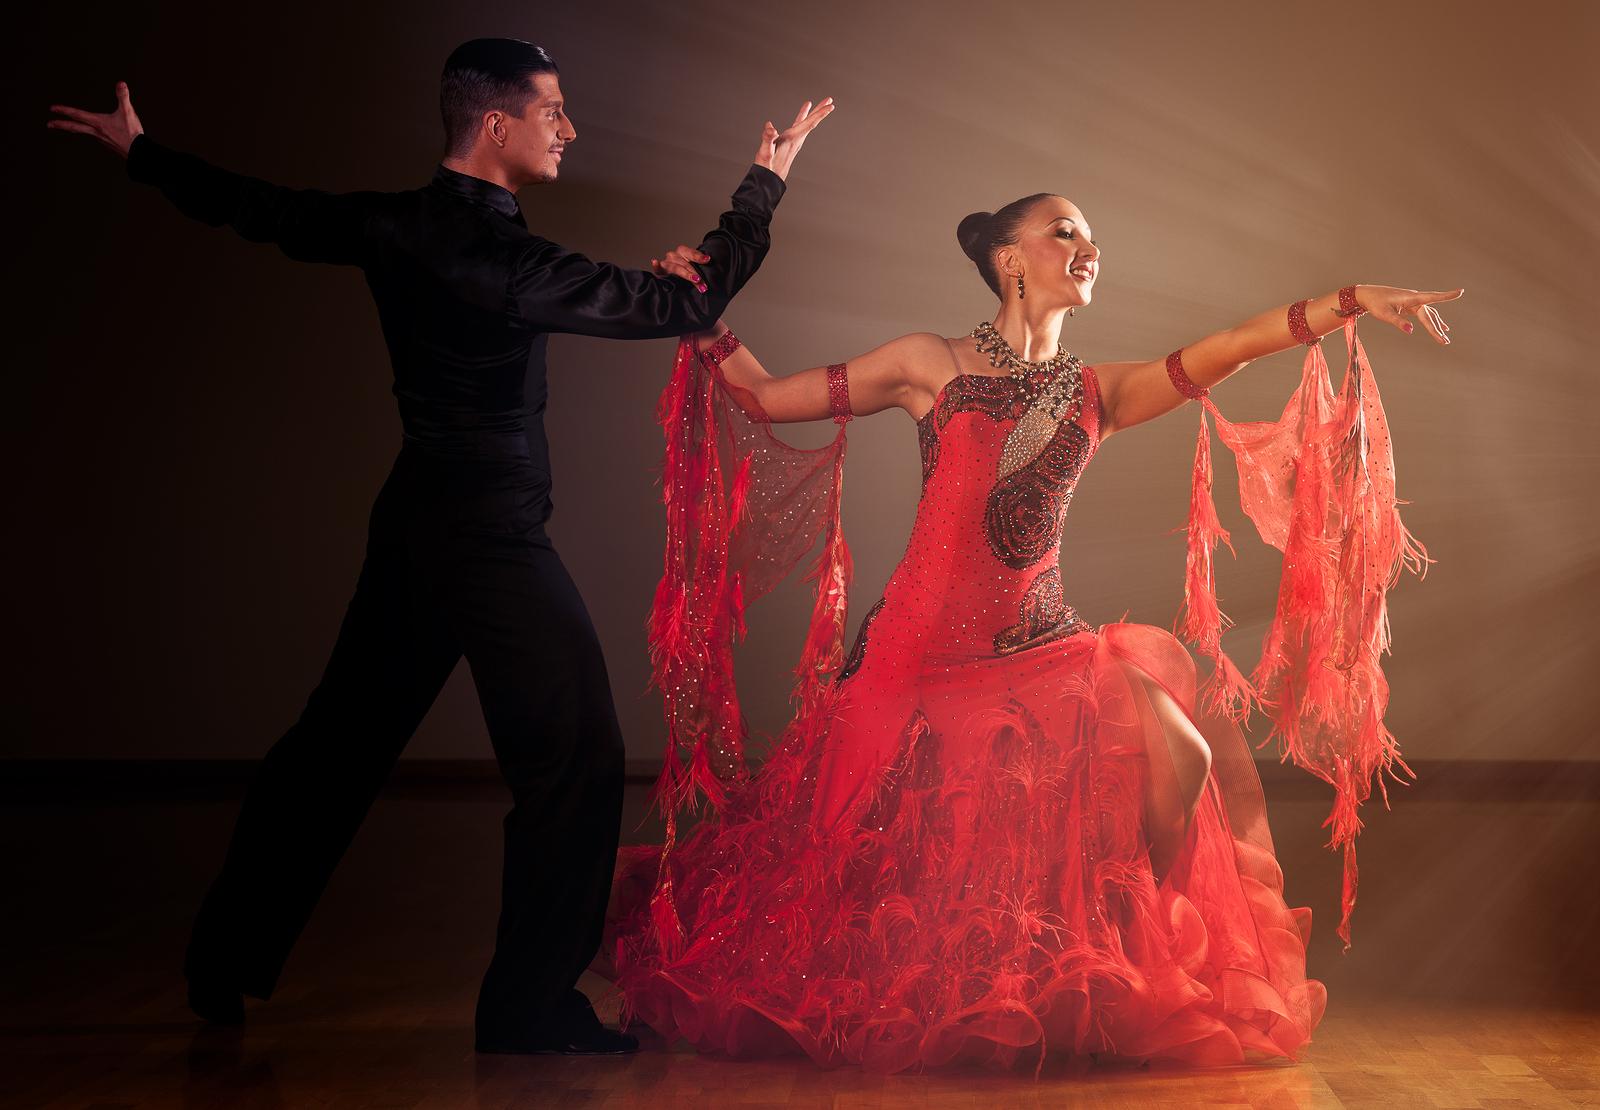 dances dynamic ballroom